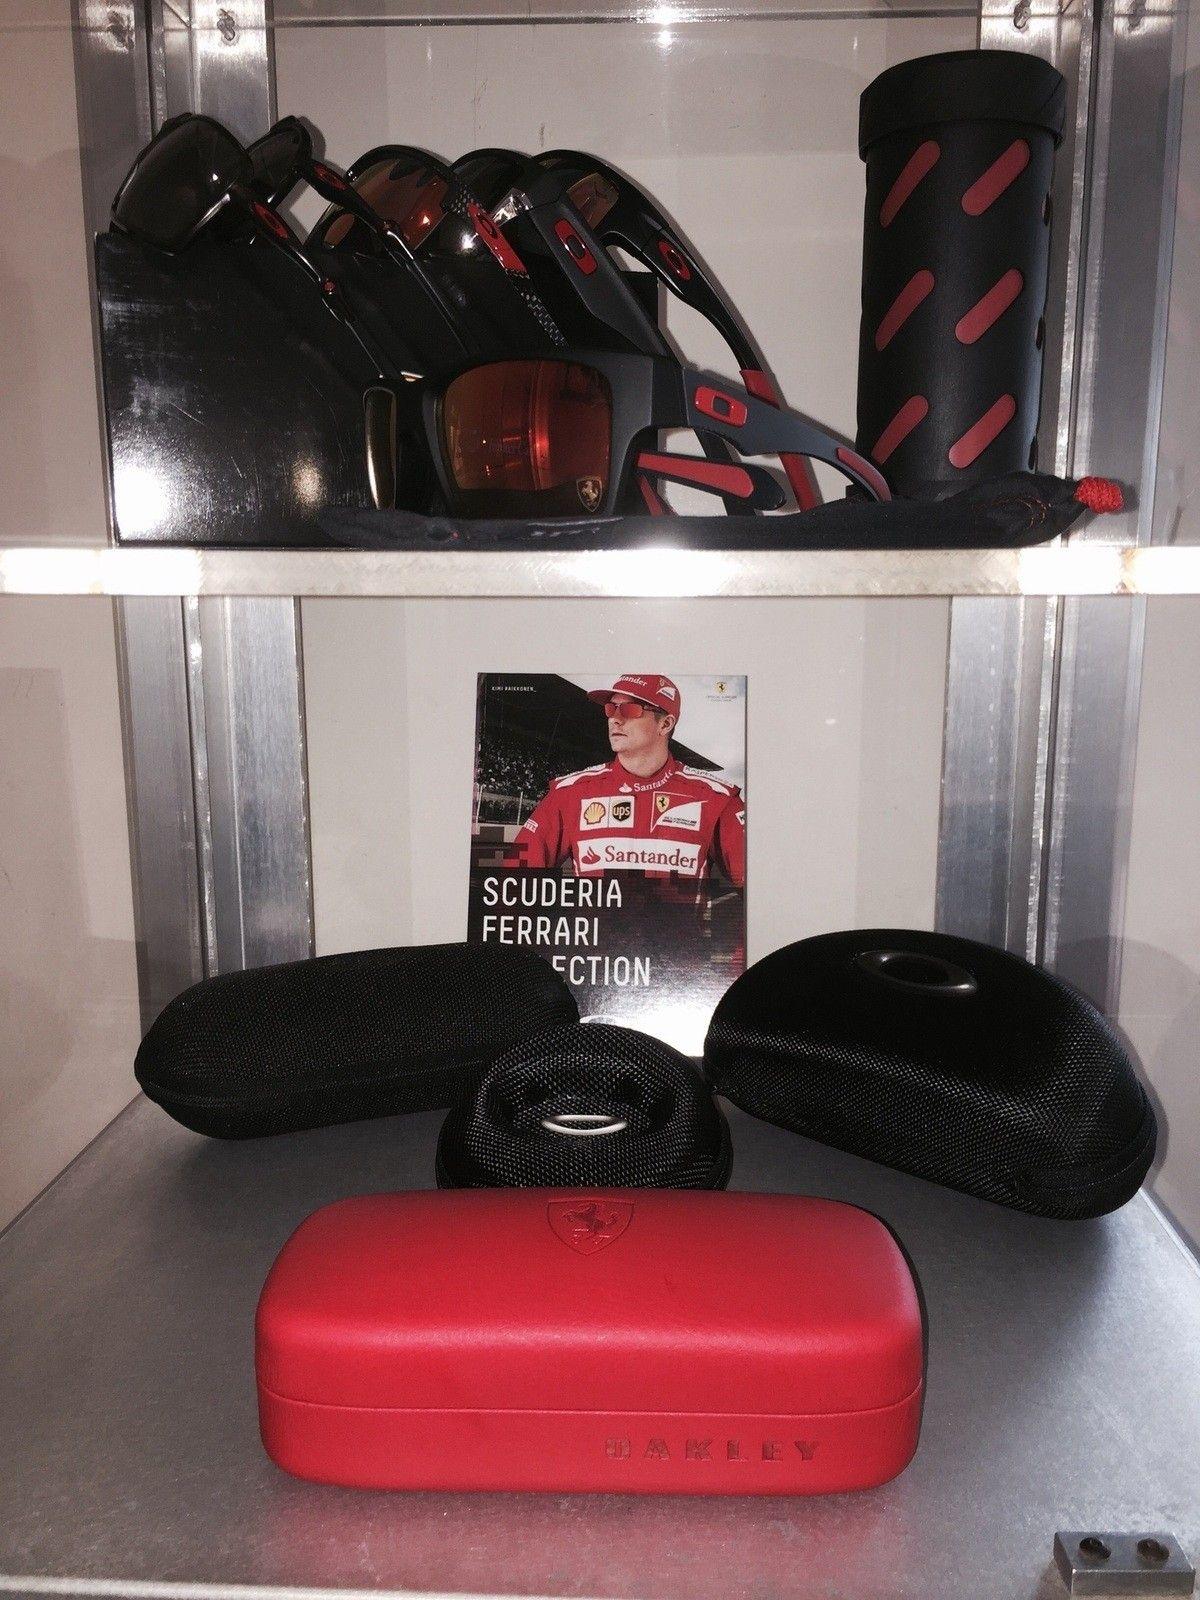 New Ferrari bad boys - image.jpg